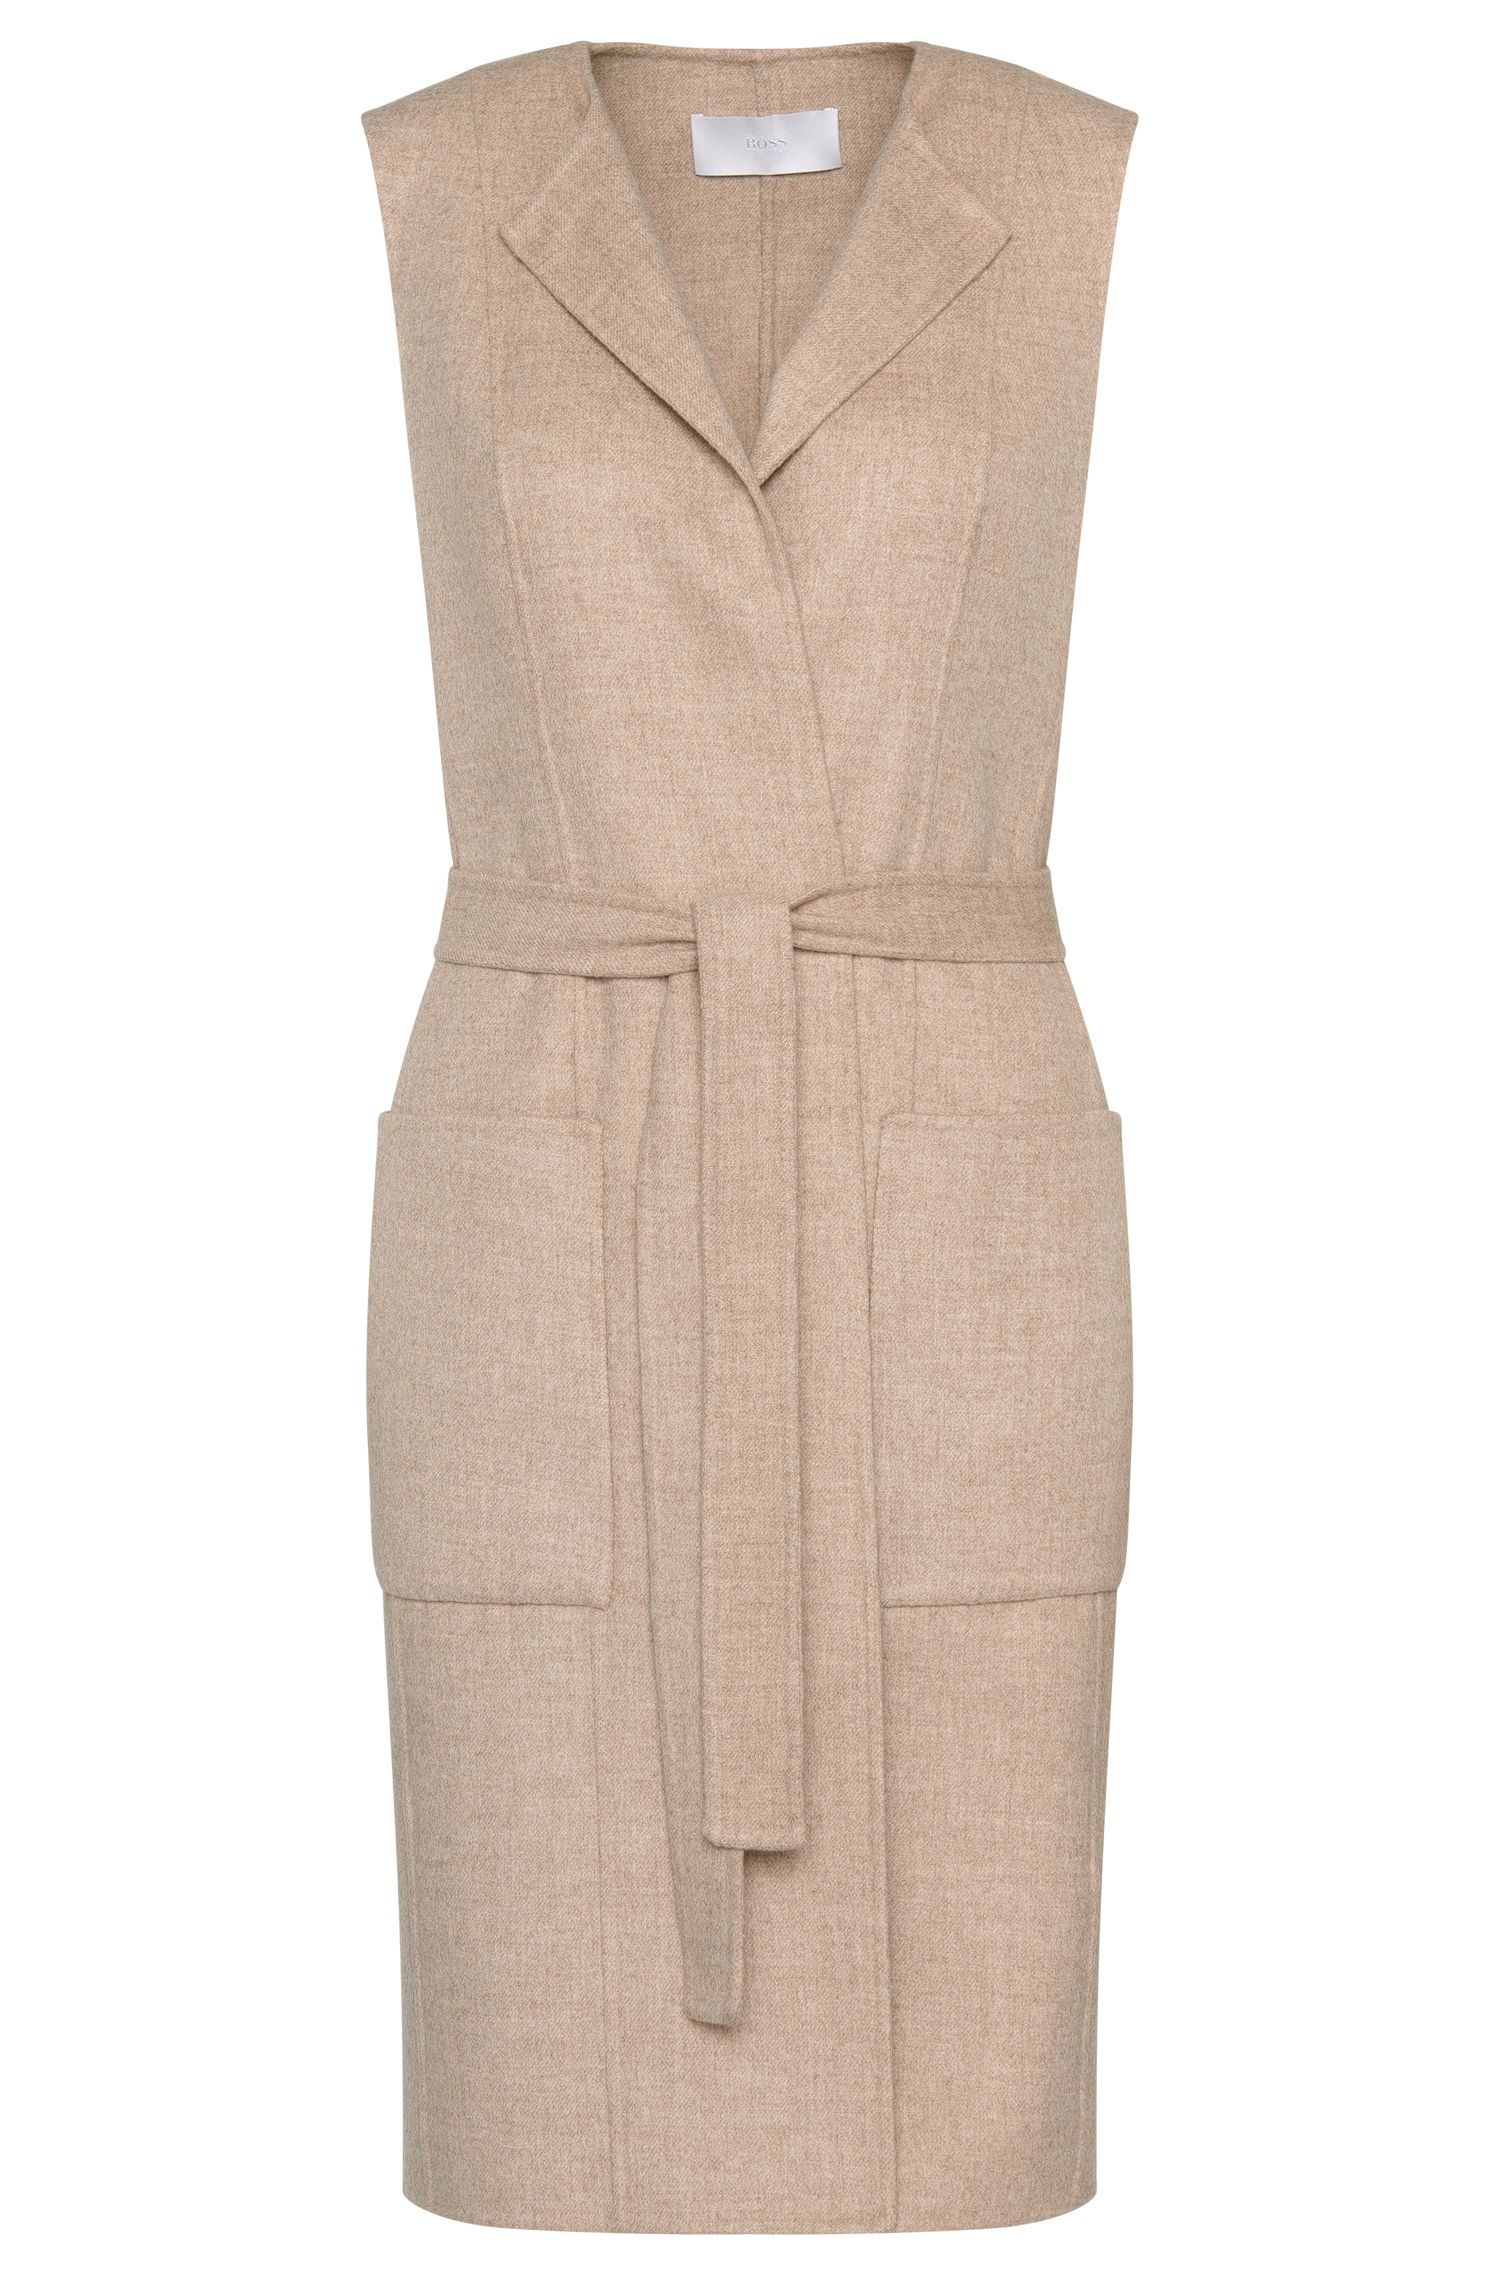 'Katsyna' | Wool Blend Open-Front Belted Long Vest